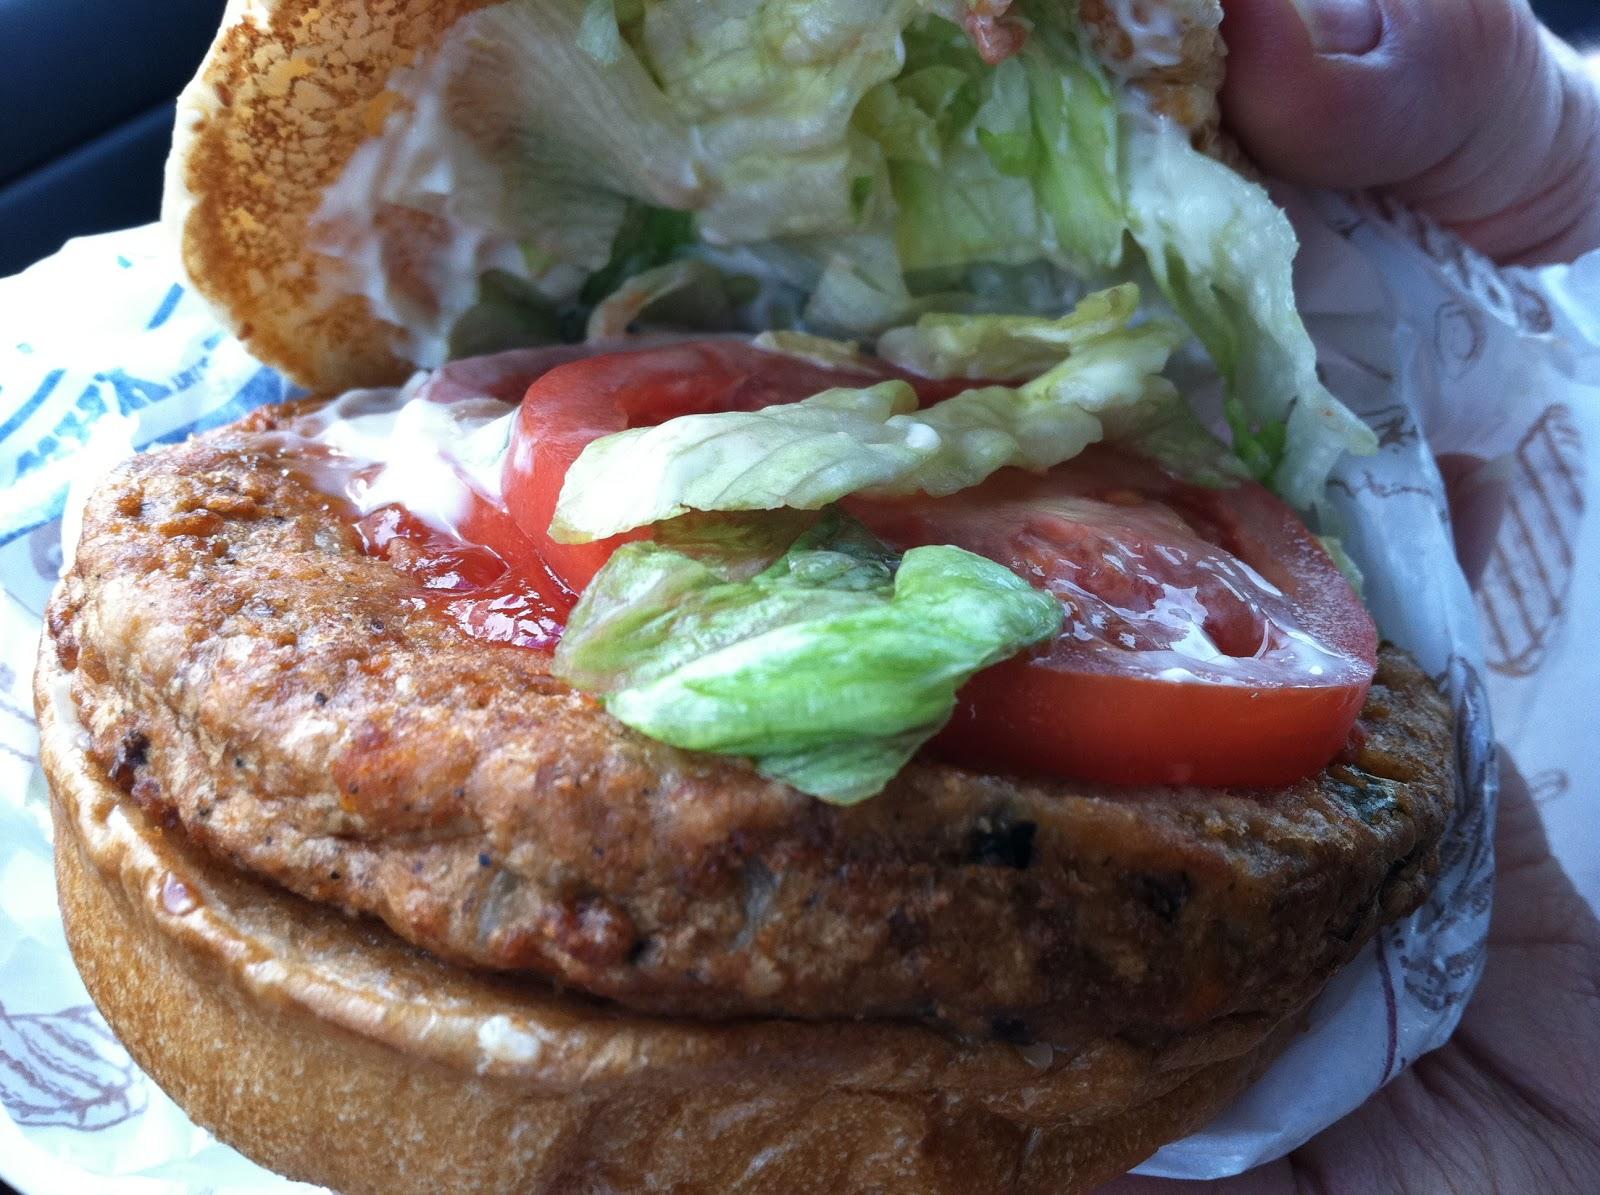 Almost Vegetarian Finding Vegetarian Food At Fast Food Restaurants Drive Thrus